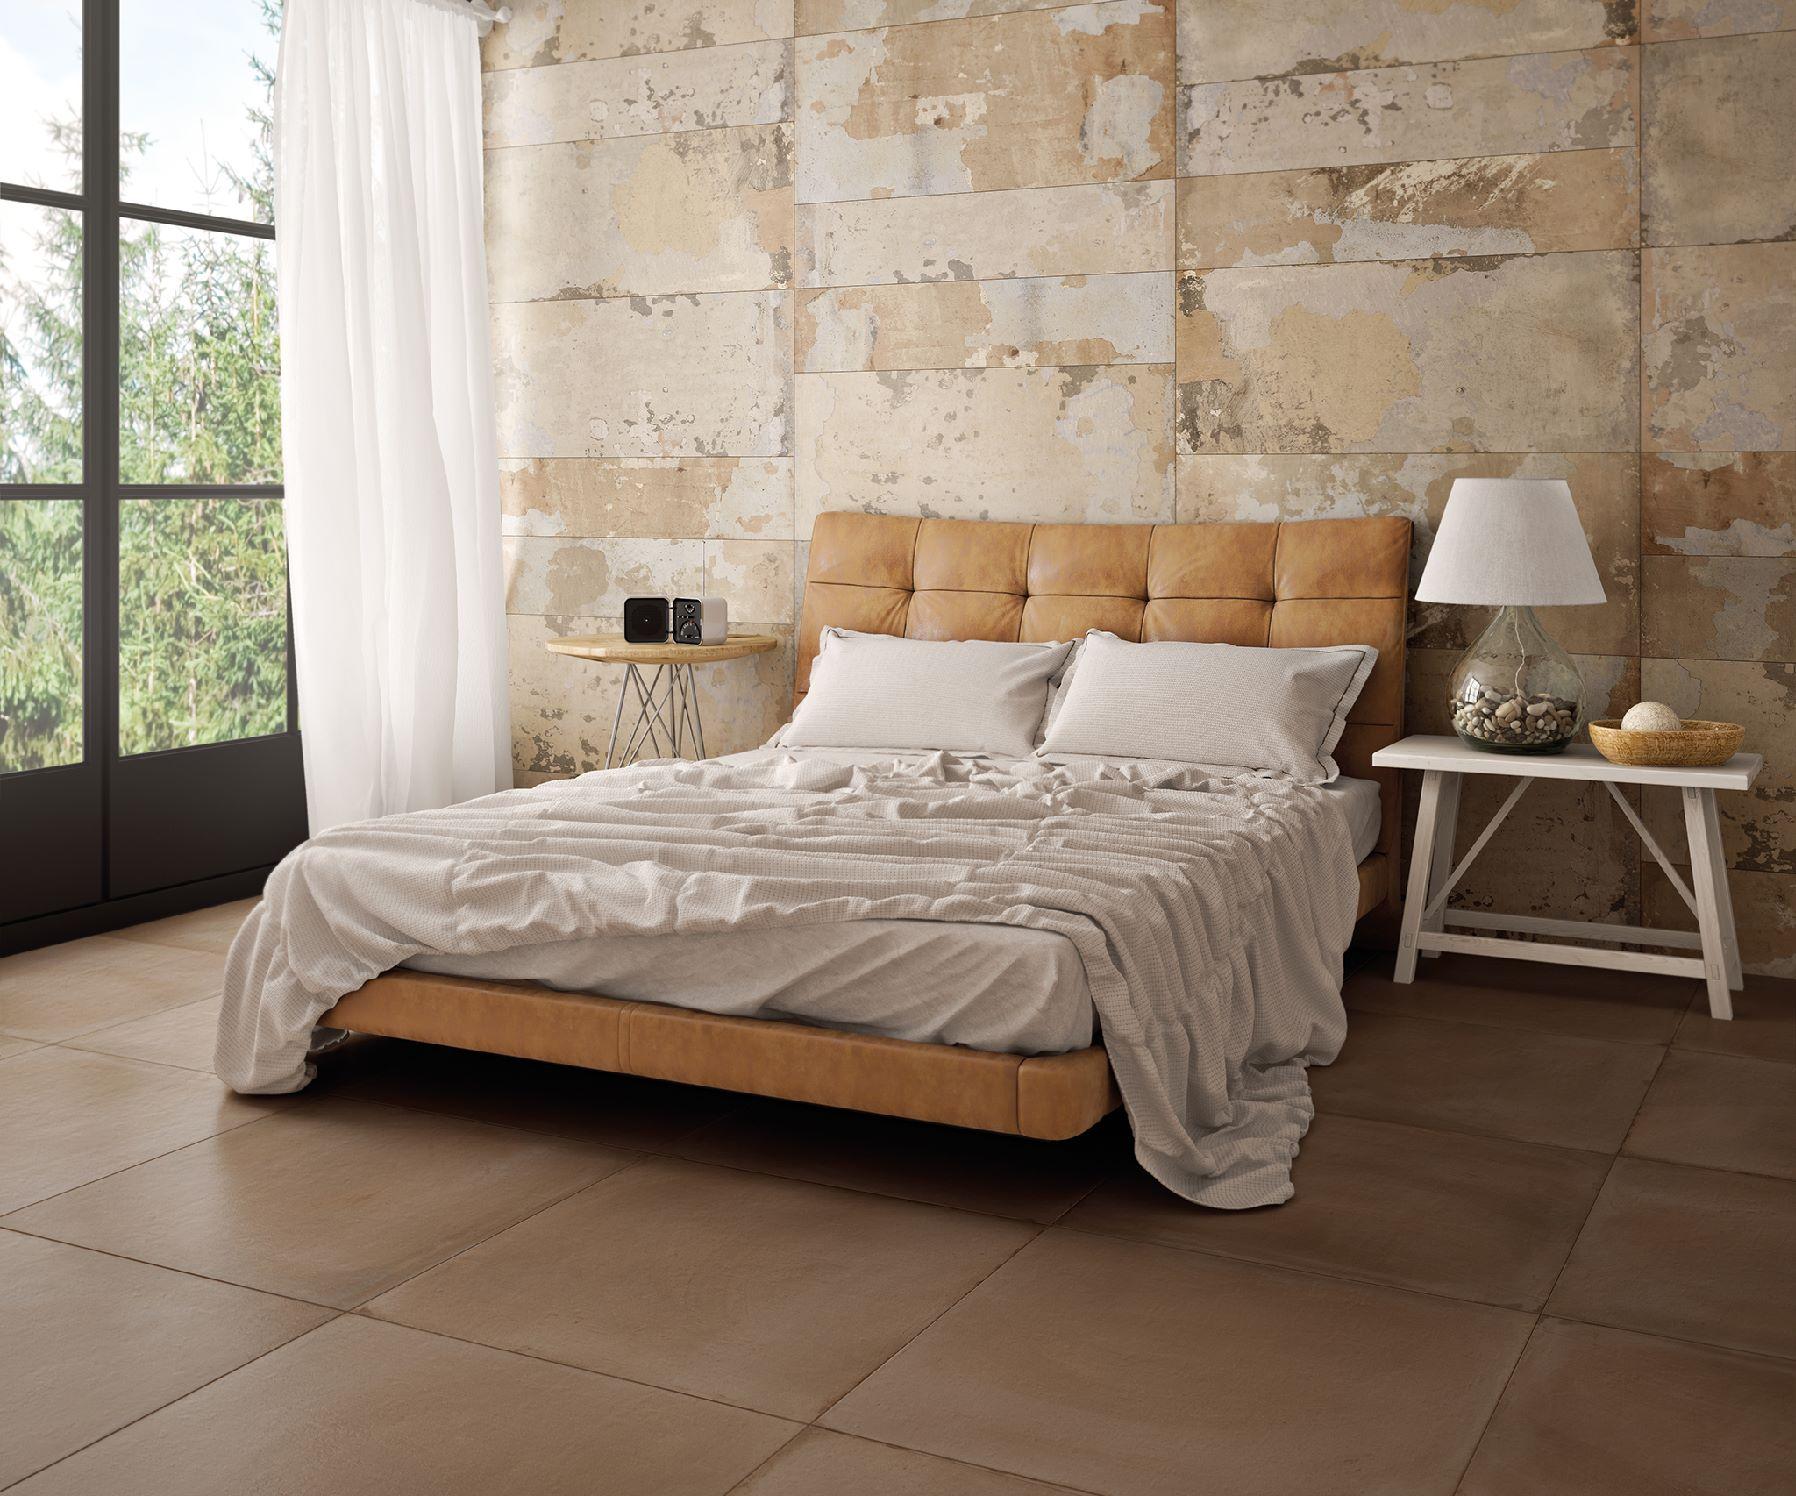 carrelage 75 75 b ton cire rectifie teinte dans la masse imitation c30 vente de carrelage. Black Bedroom Furniture Sets. Home Design Ideas